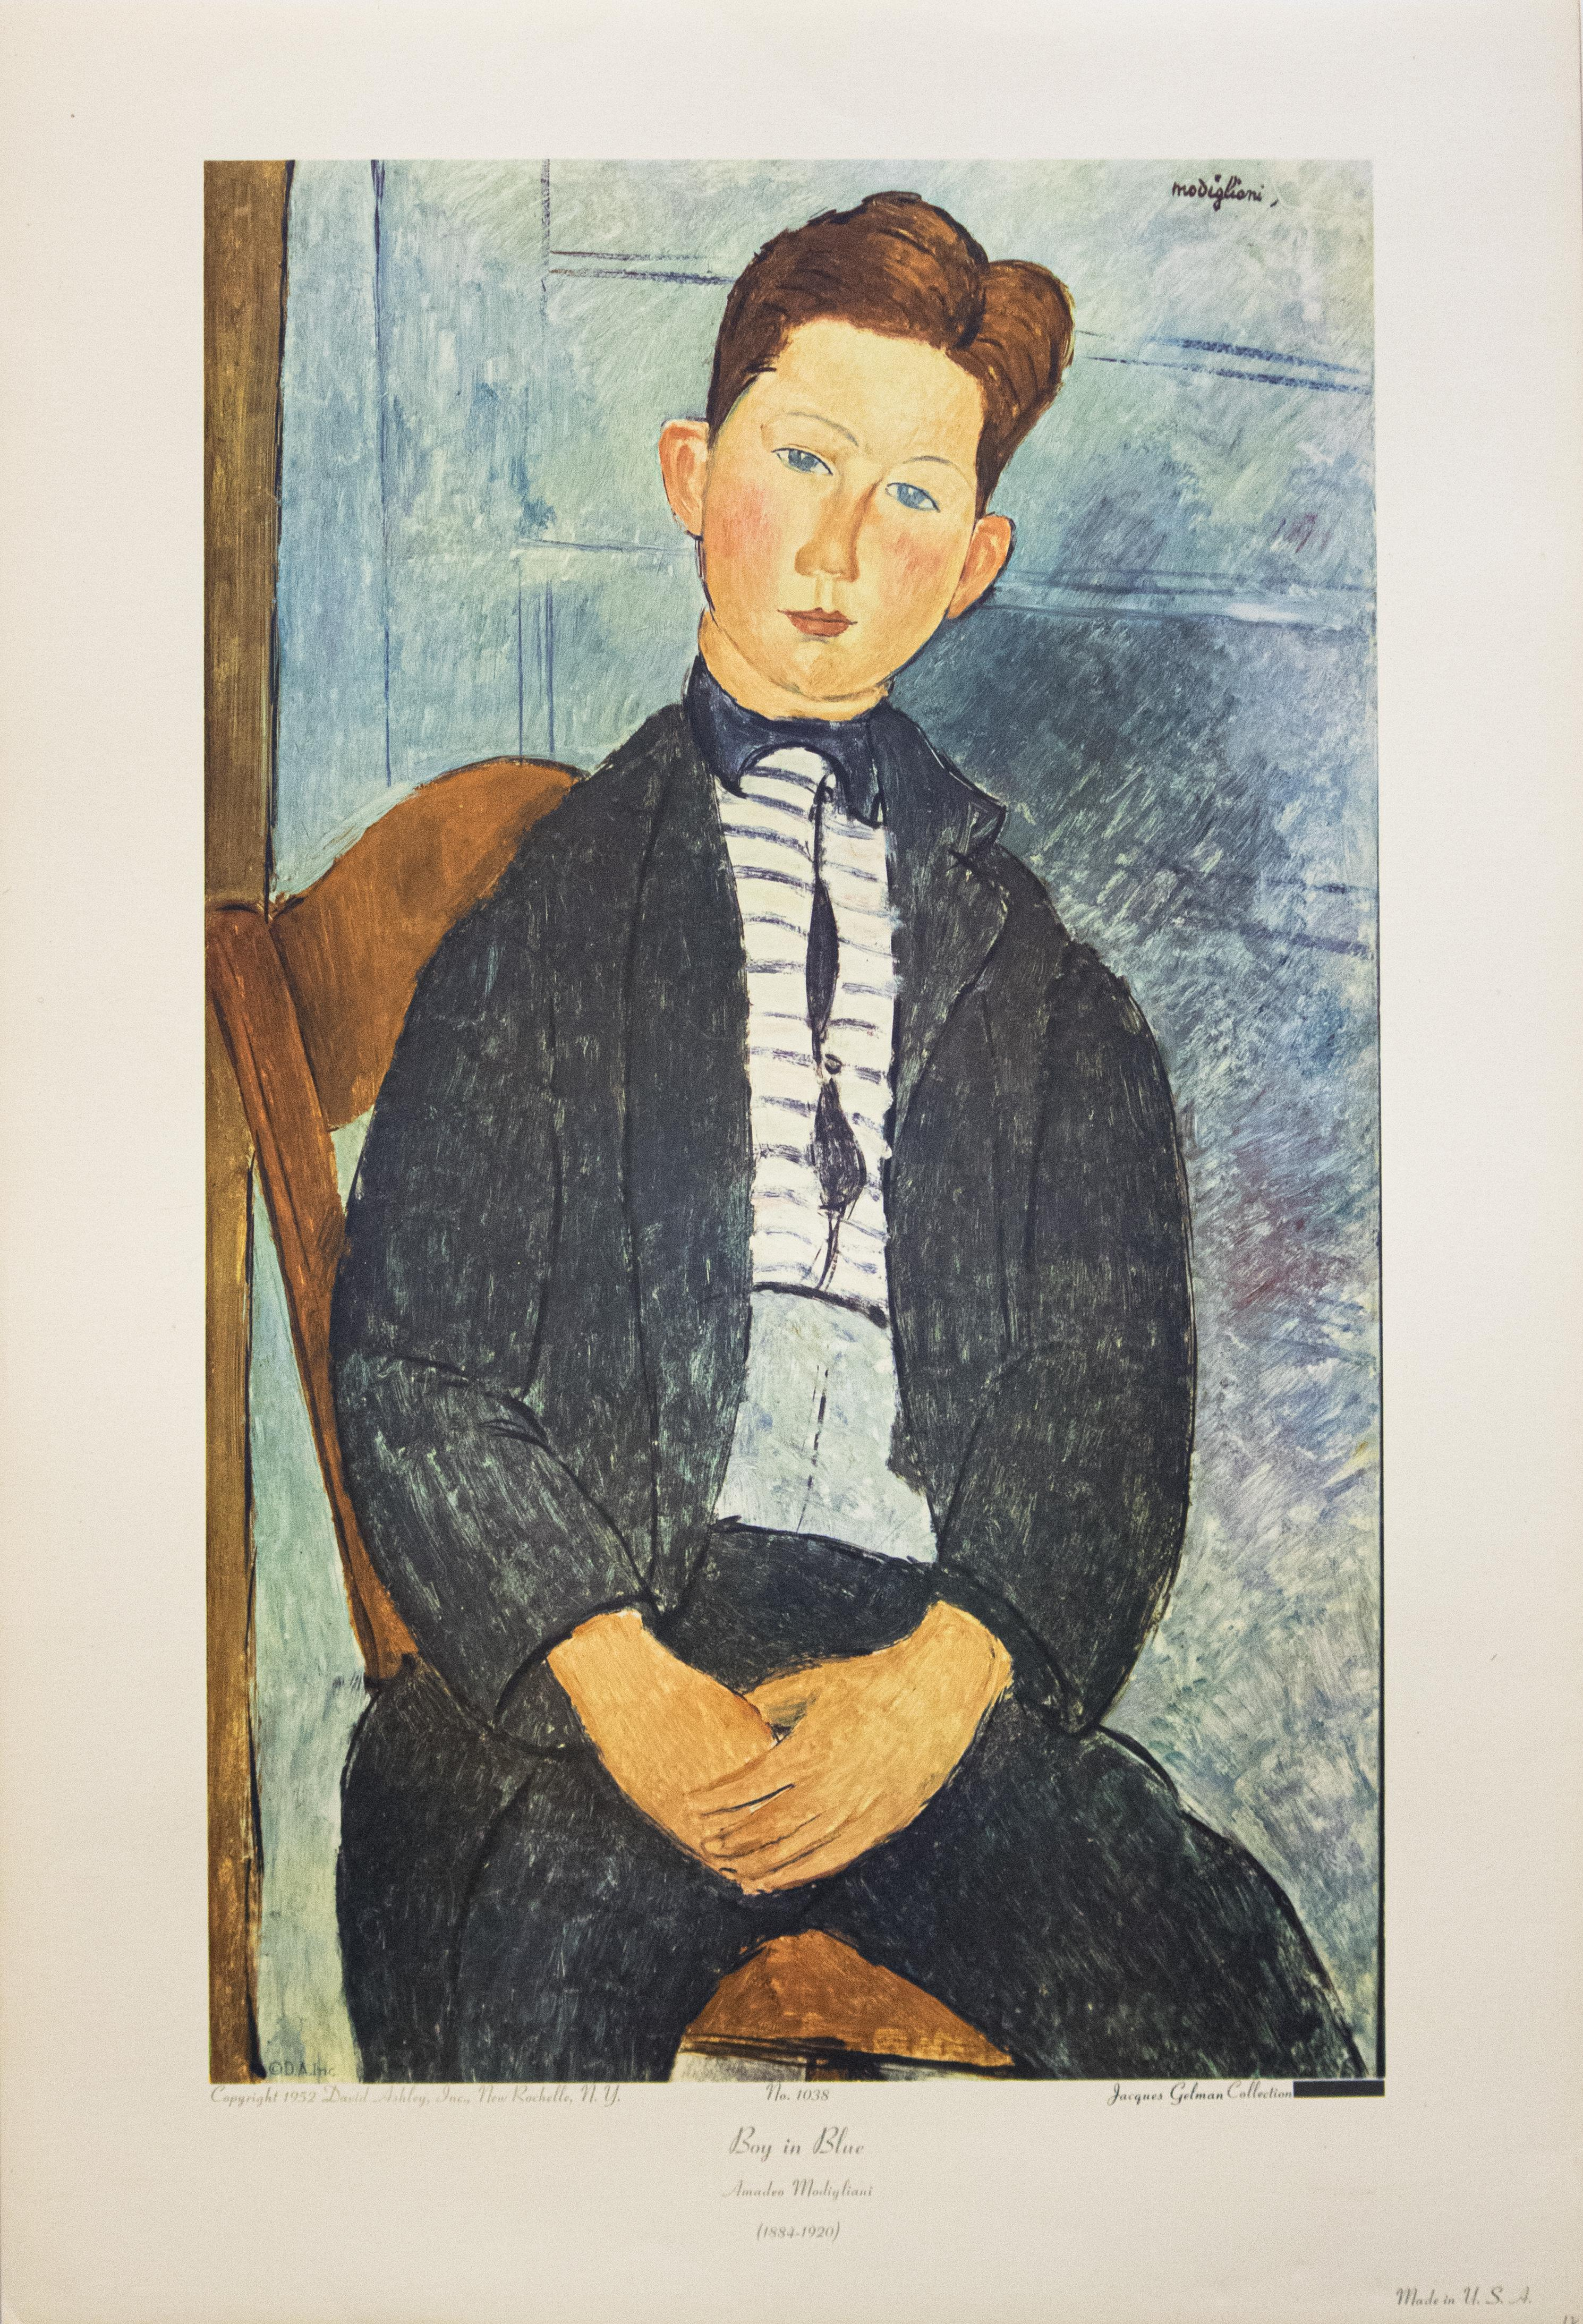 """Boy In Blue"" Print After Amedeo Modigliani"